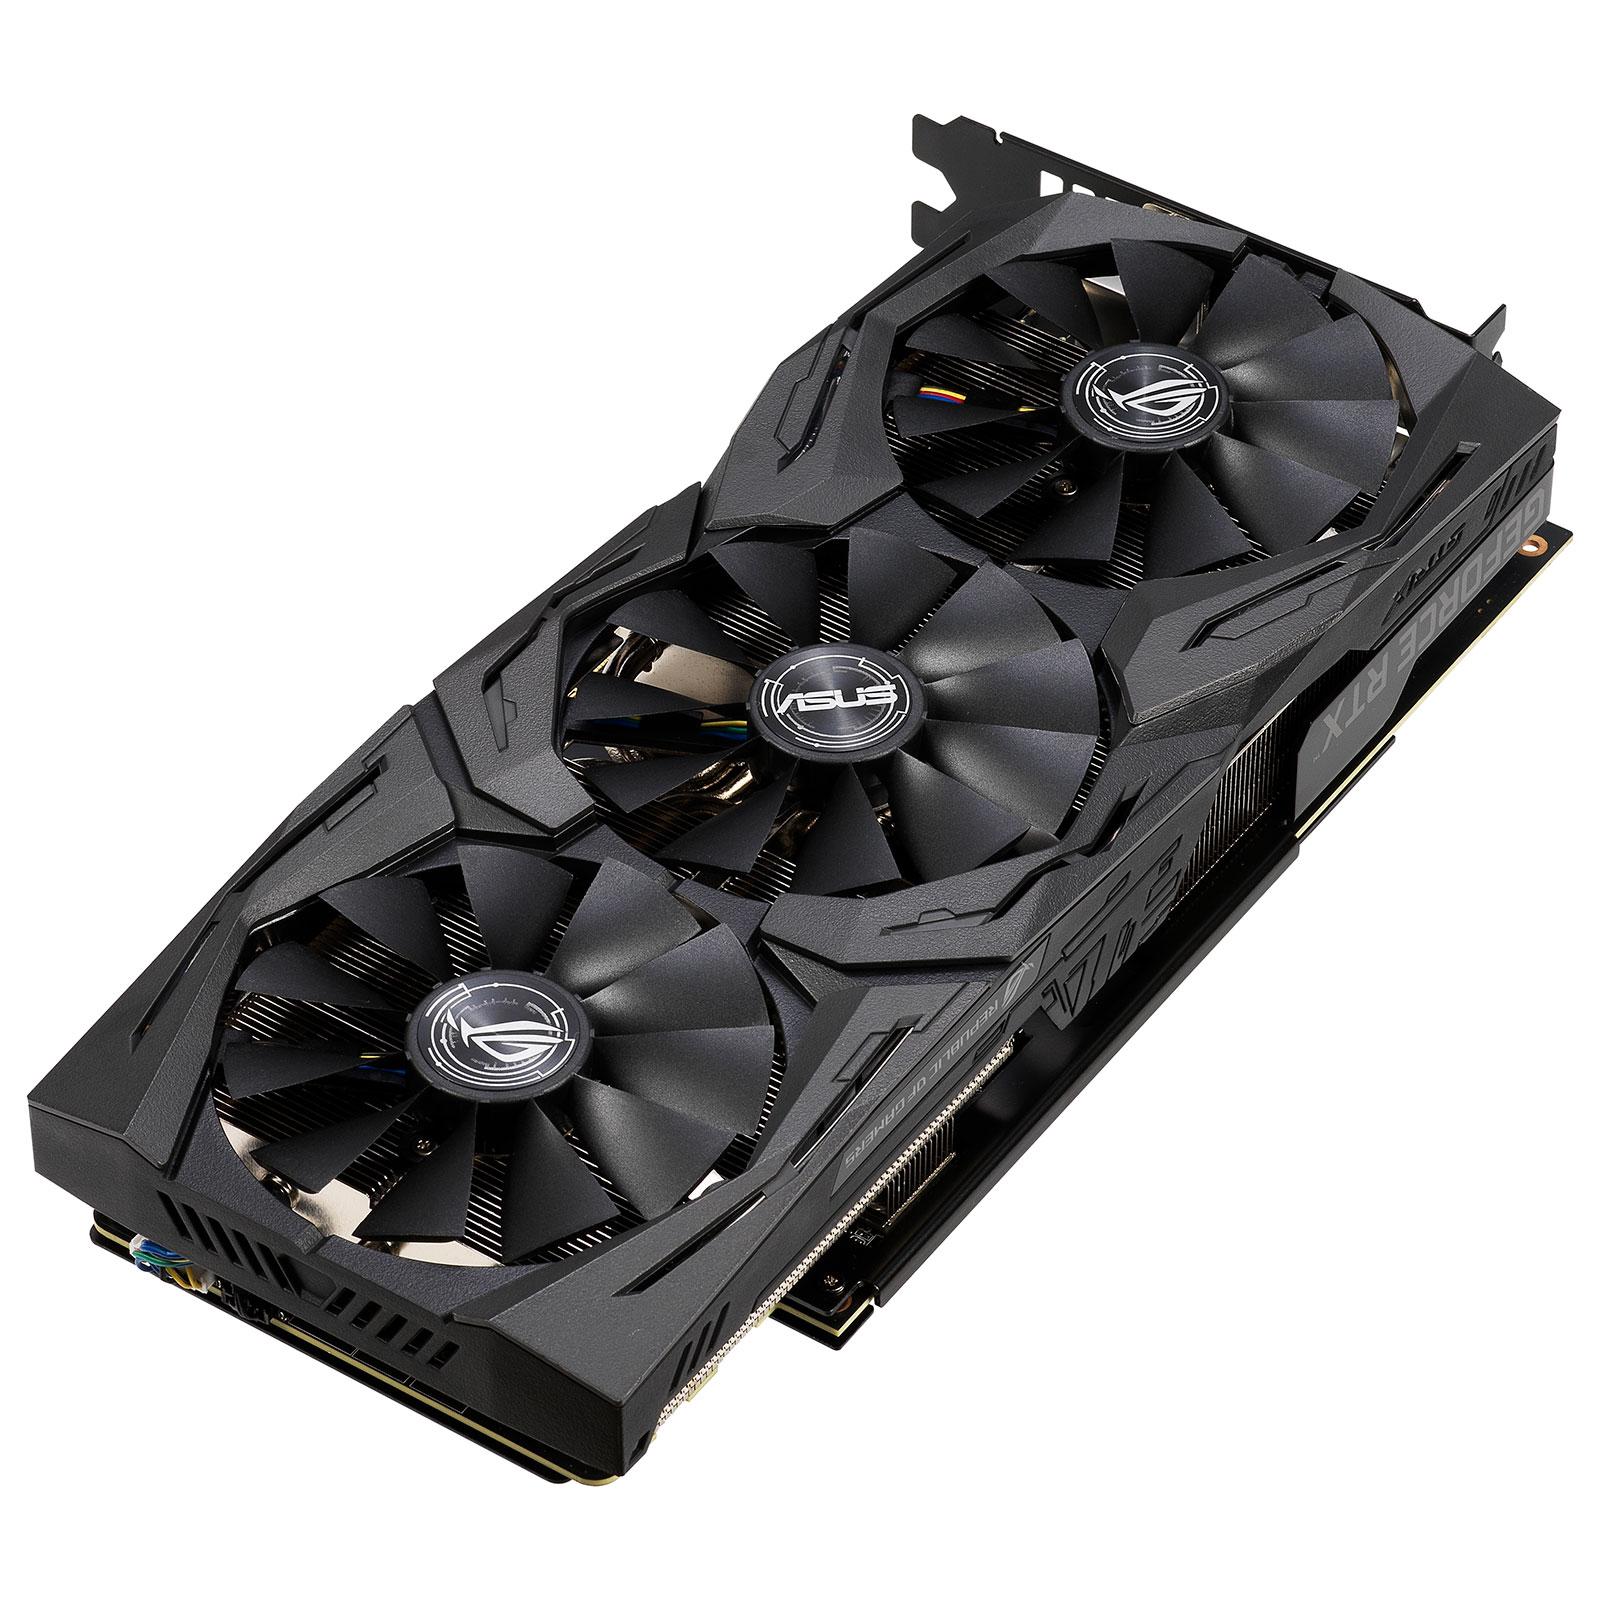 ROG Strix GeForce RTX 2060 OC Edition 6GB GDDR6 (90YV0CI0-M0NA00) - Achat / Vente Carte graphique sur Picata.fr - 2